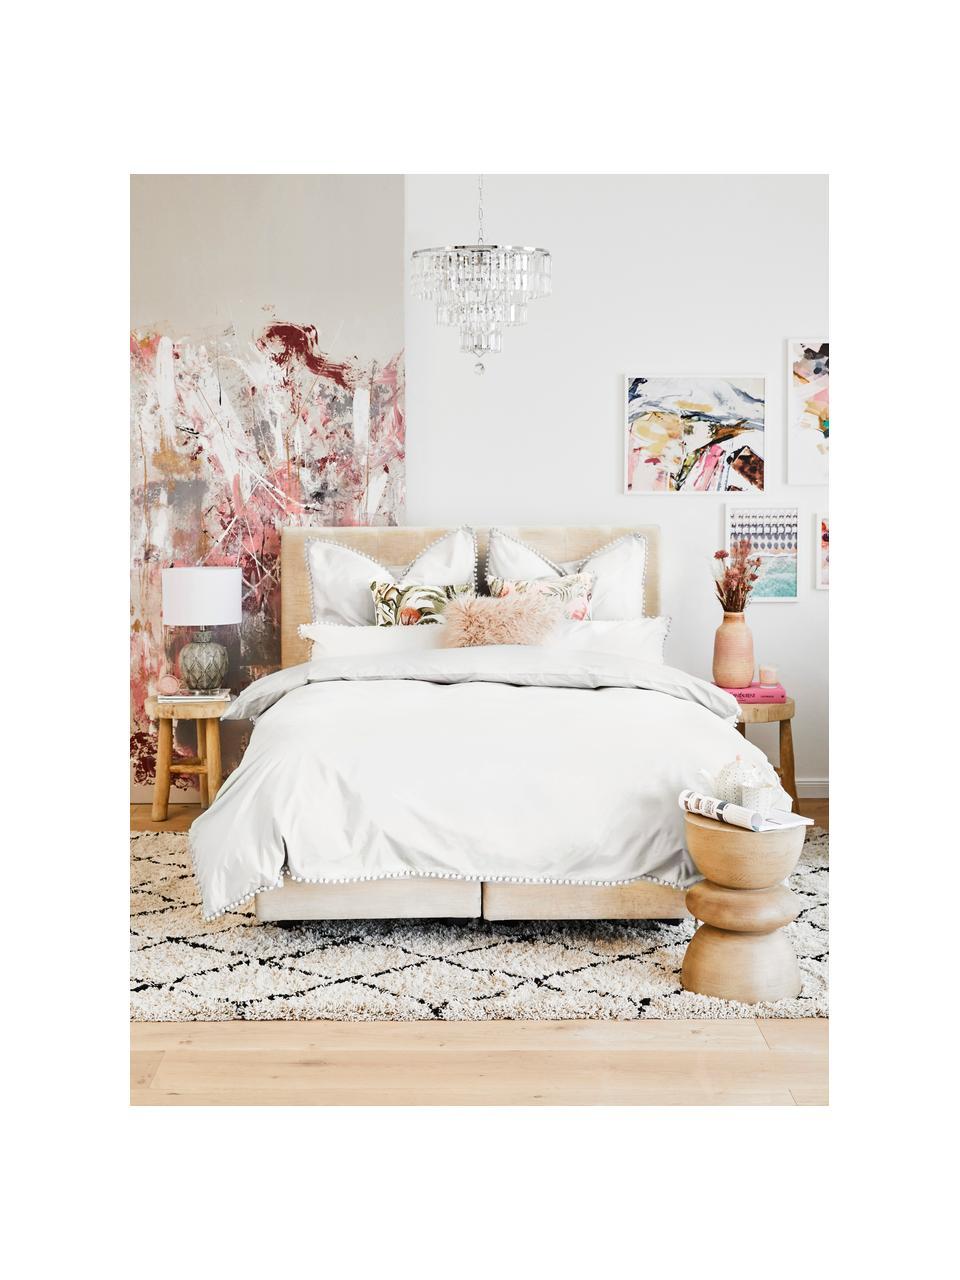 Baumwollperkal-Bettwäsche Bommy mit Pompoms, Webart: Perkal Fadendichte 200 TC, Weiß, 135 x 200 cm + 1 Kissen 80 x 80 cm